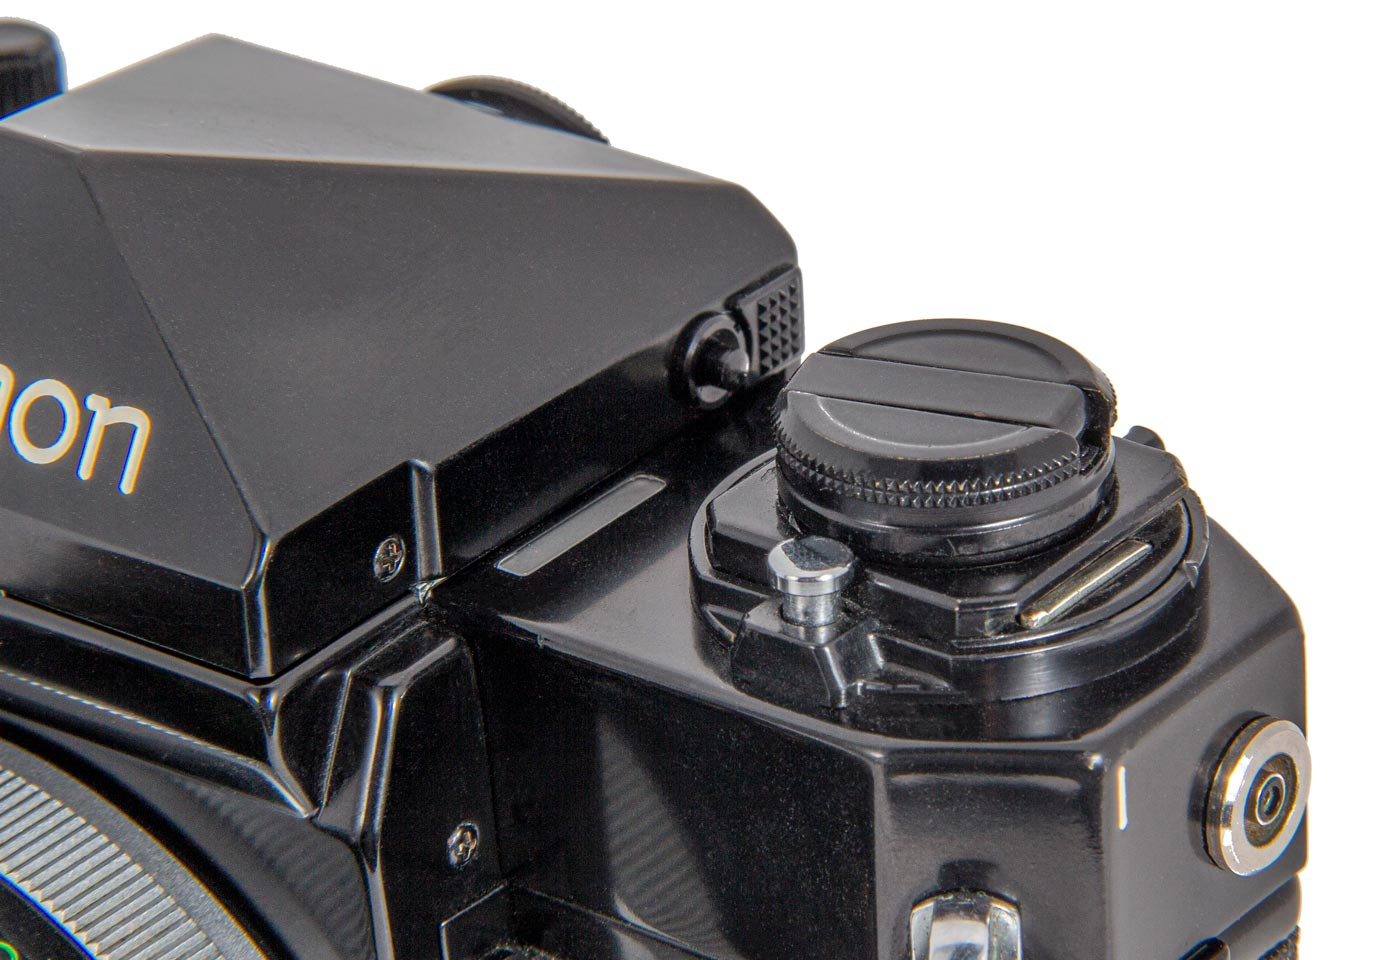 Canon F-1 Flash Coupler Mount